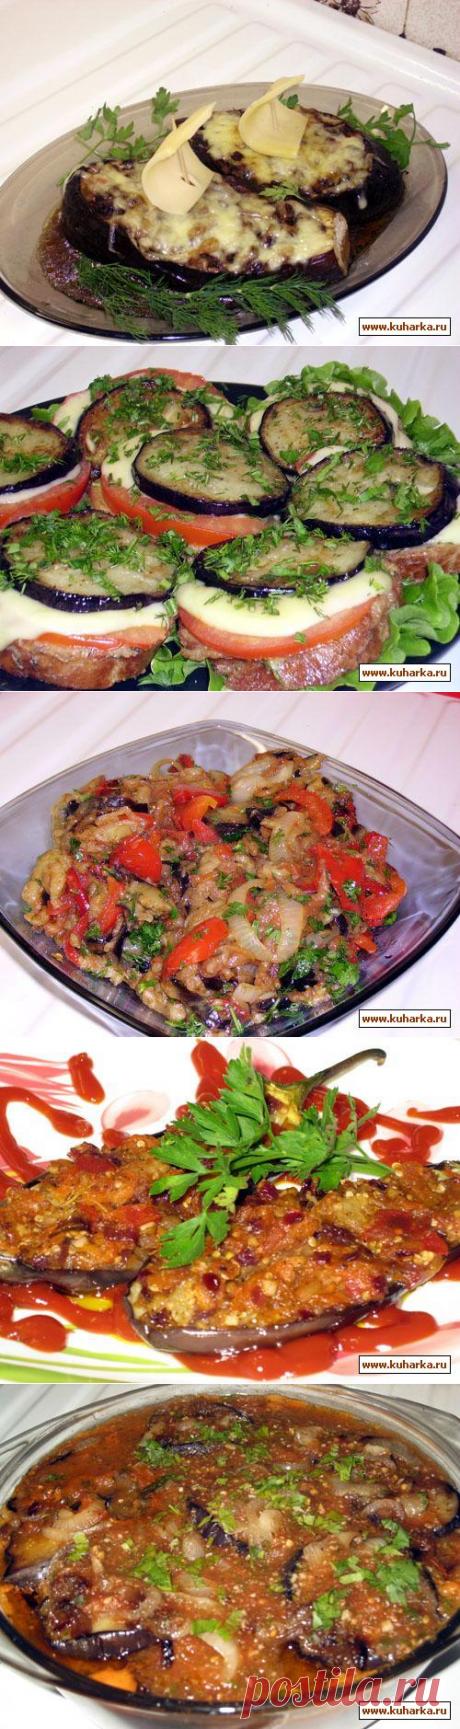 Eggplants dishes